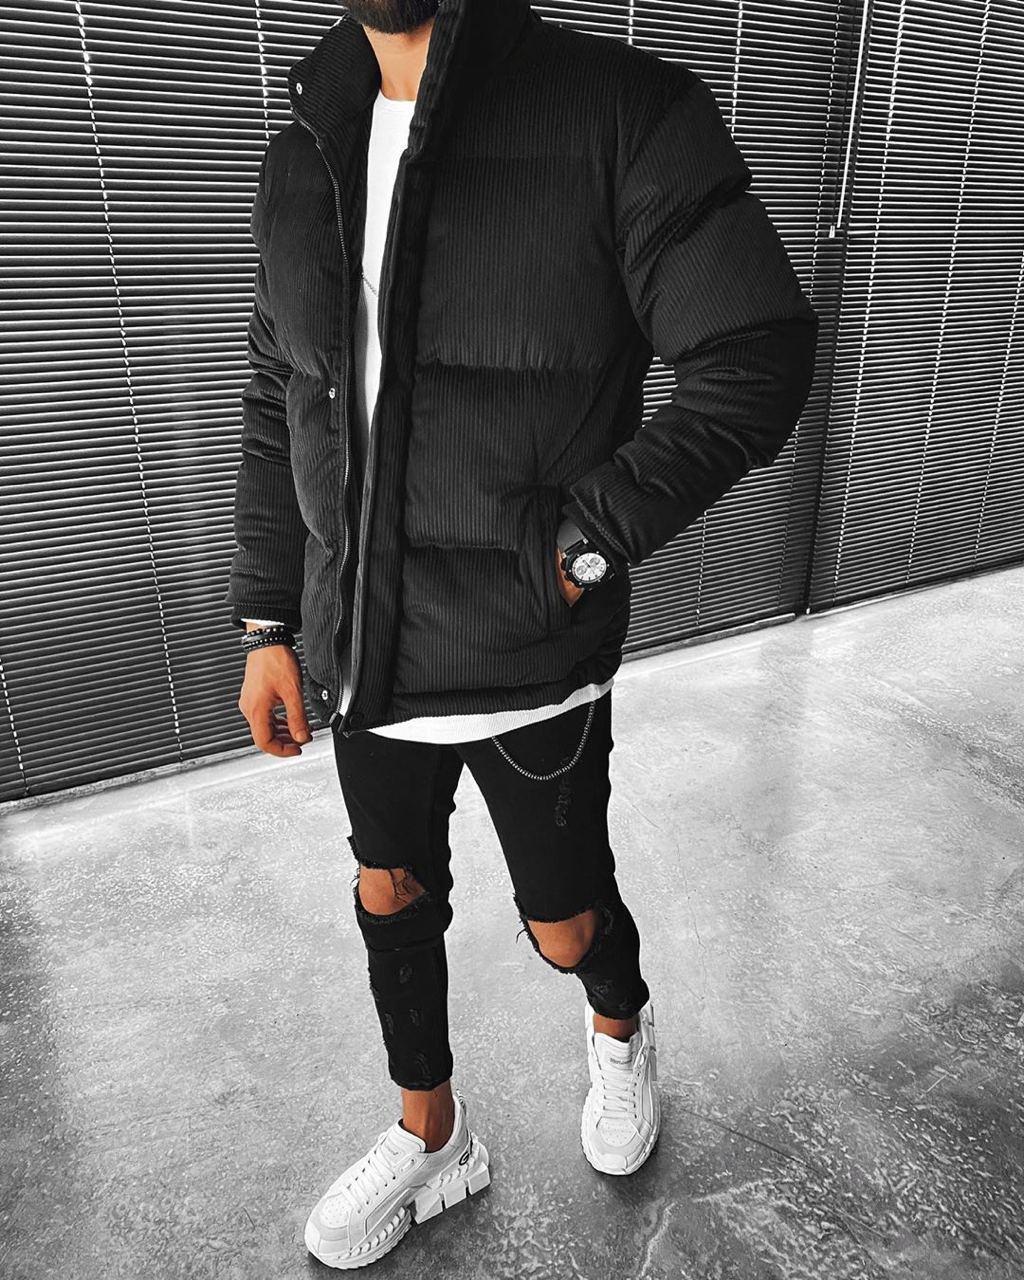 😜 Куртка - Мужскаяя куртка зима велюр (черная)